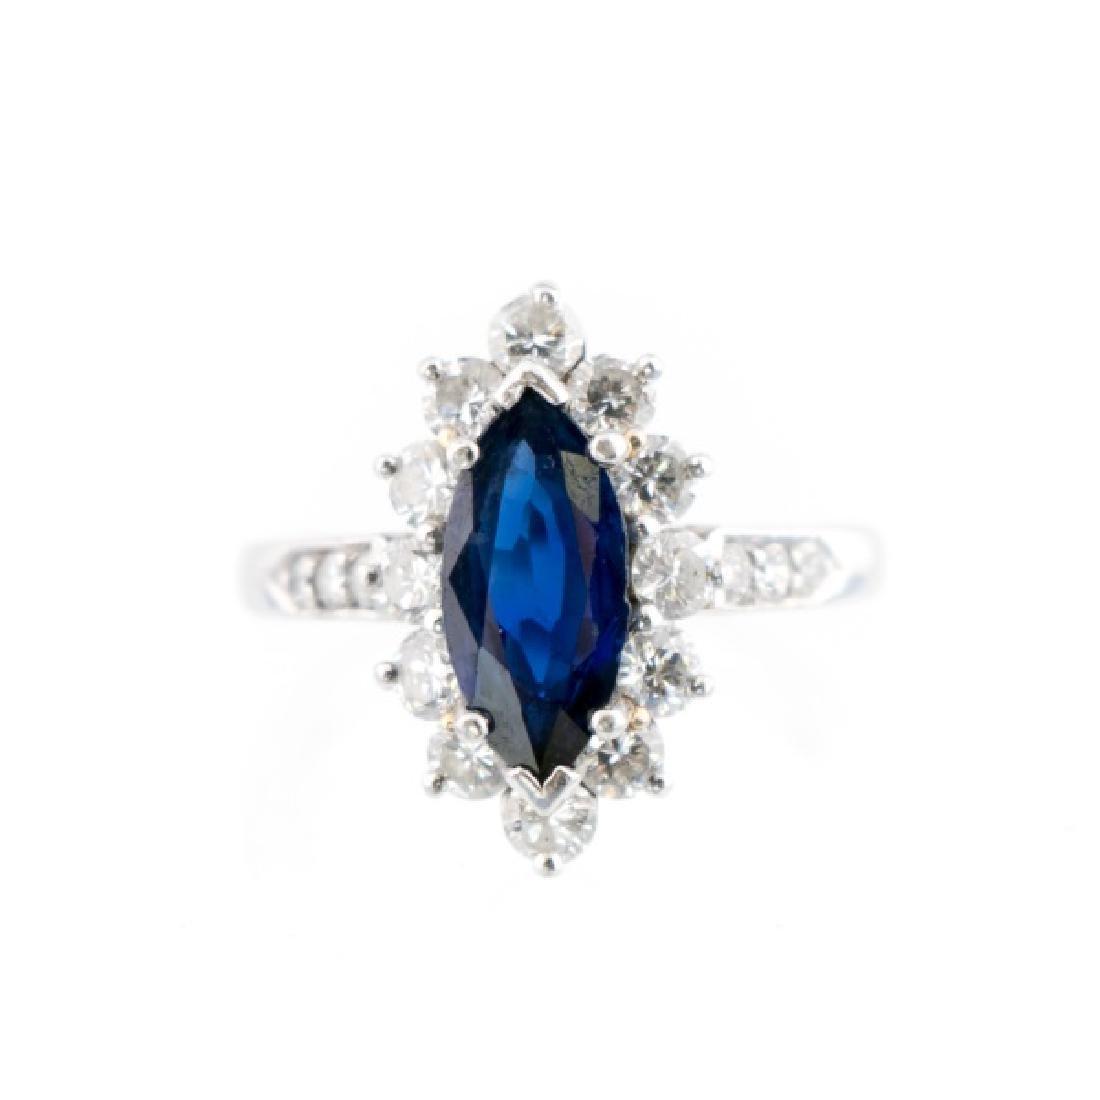 Platinum, Marquise Cut Sapphire, & Diamond Ring